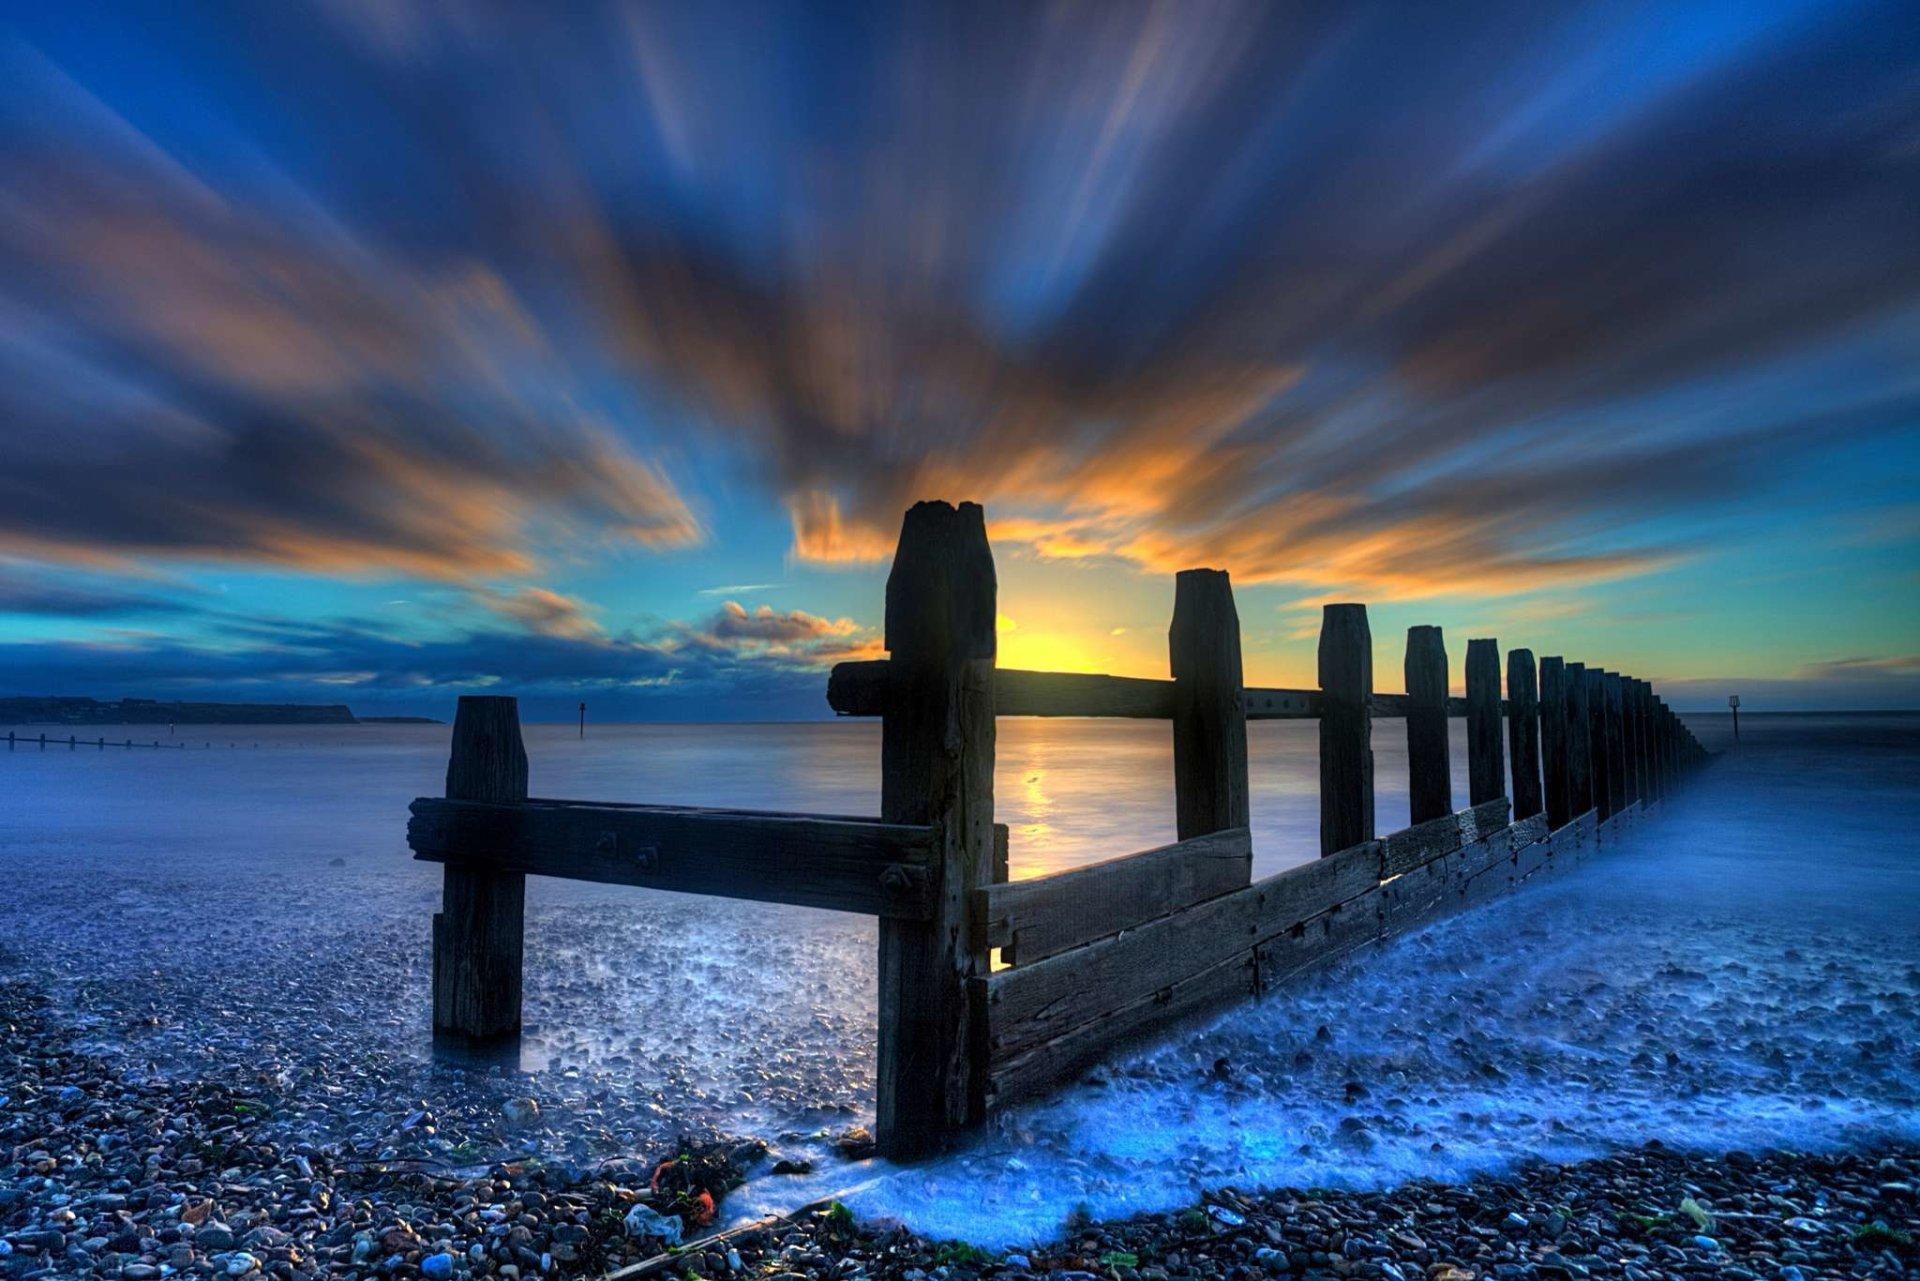 Man Made - Fence  Sky Blue Sunset Ocean Sea Wallpaper